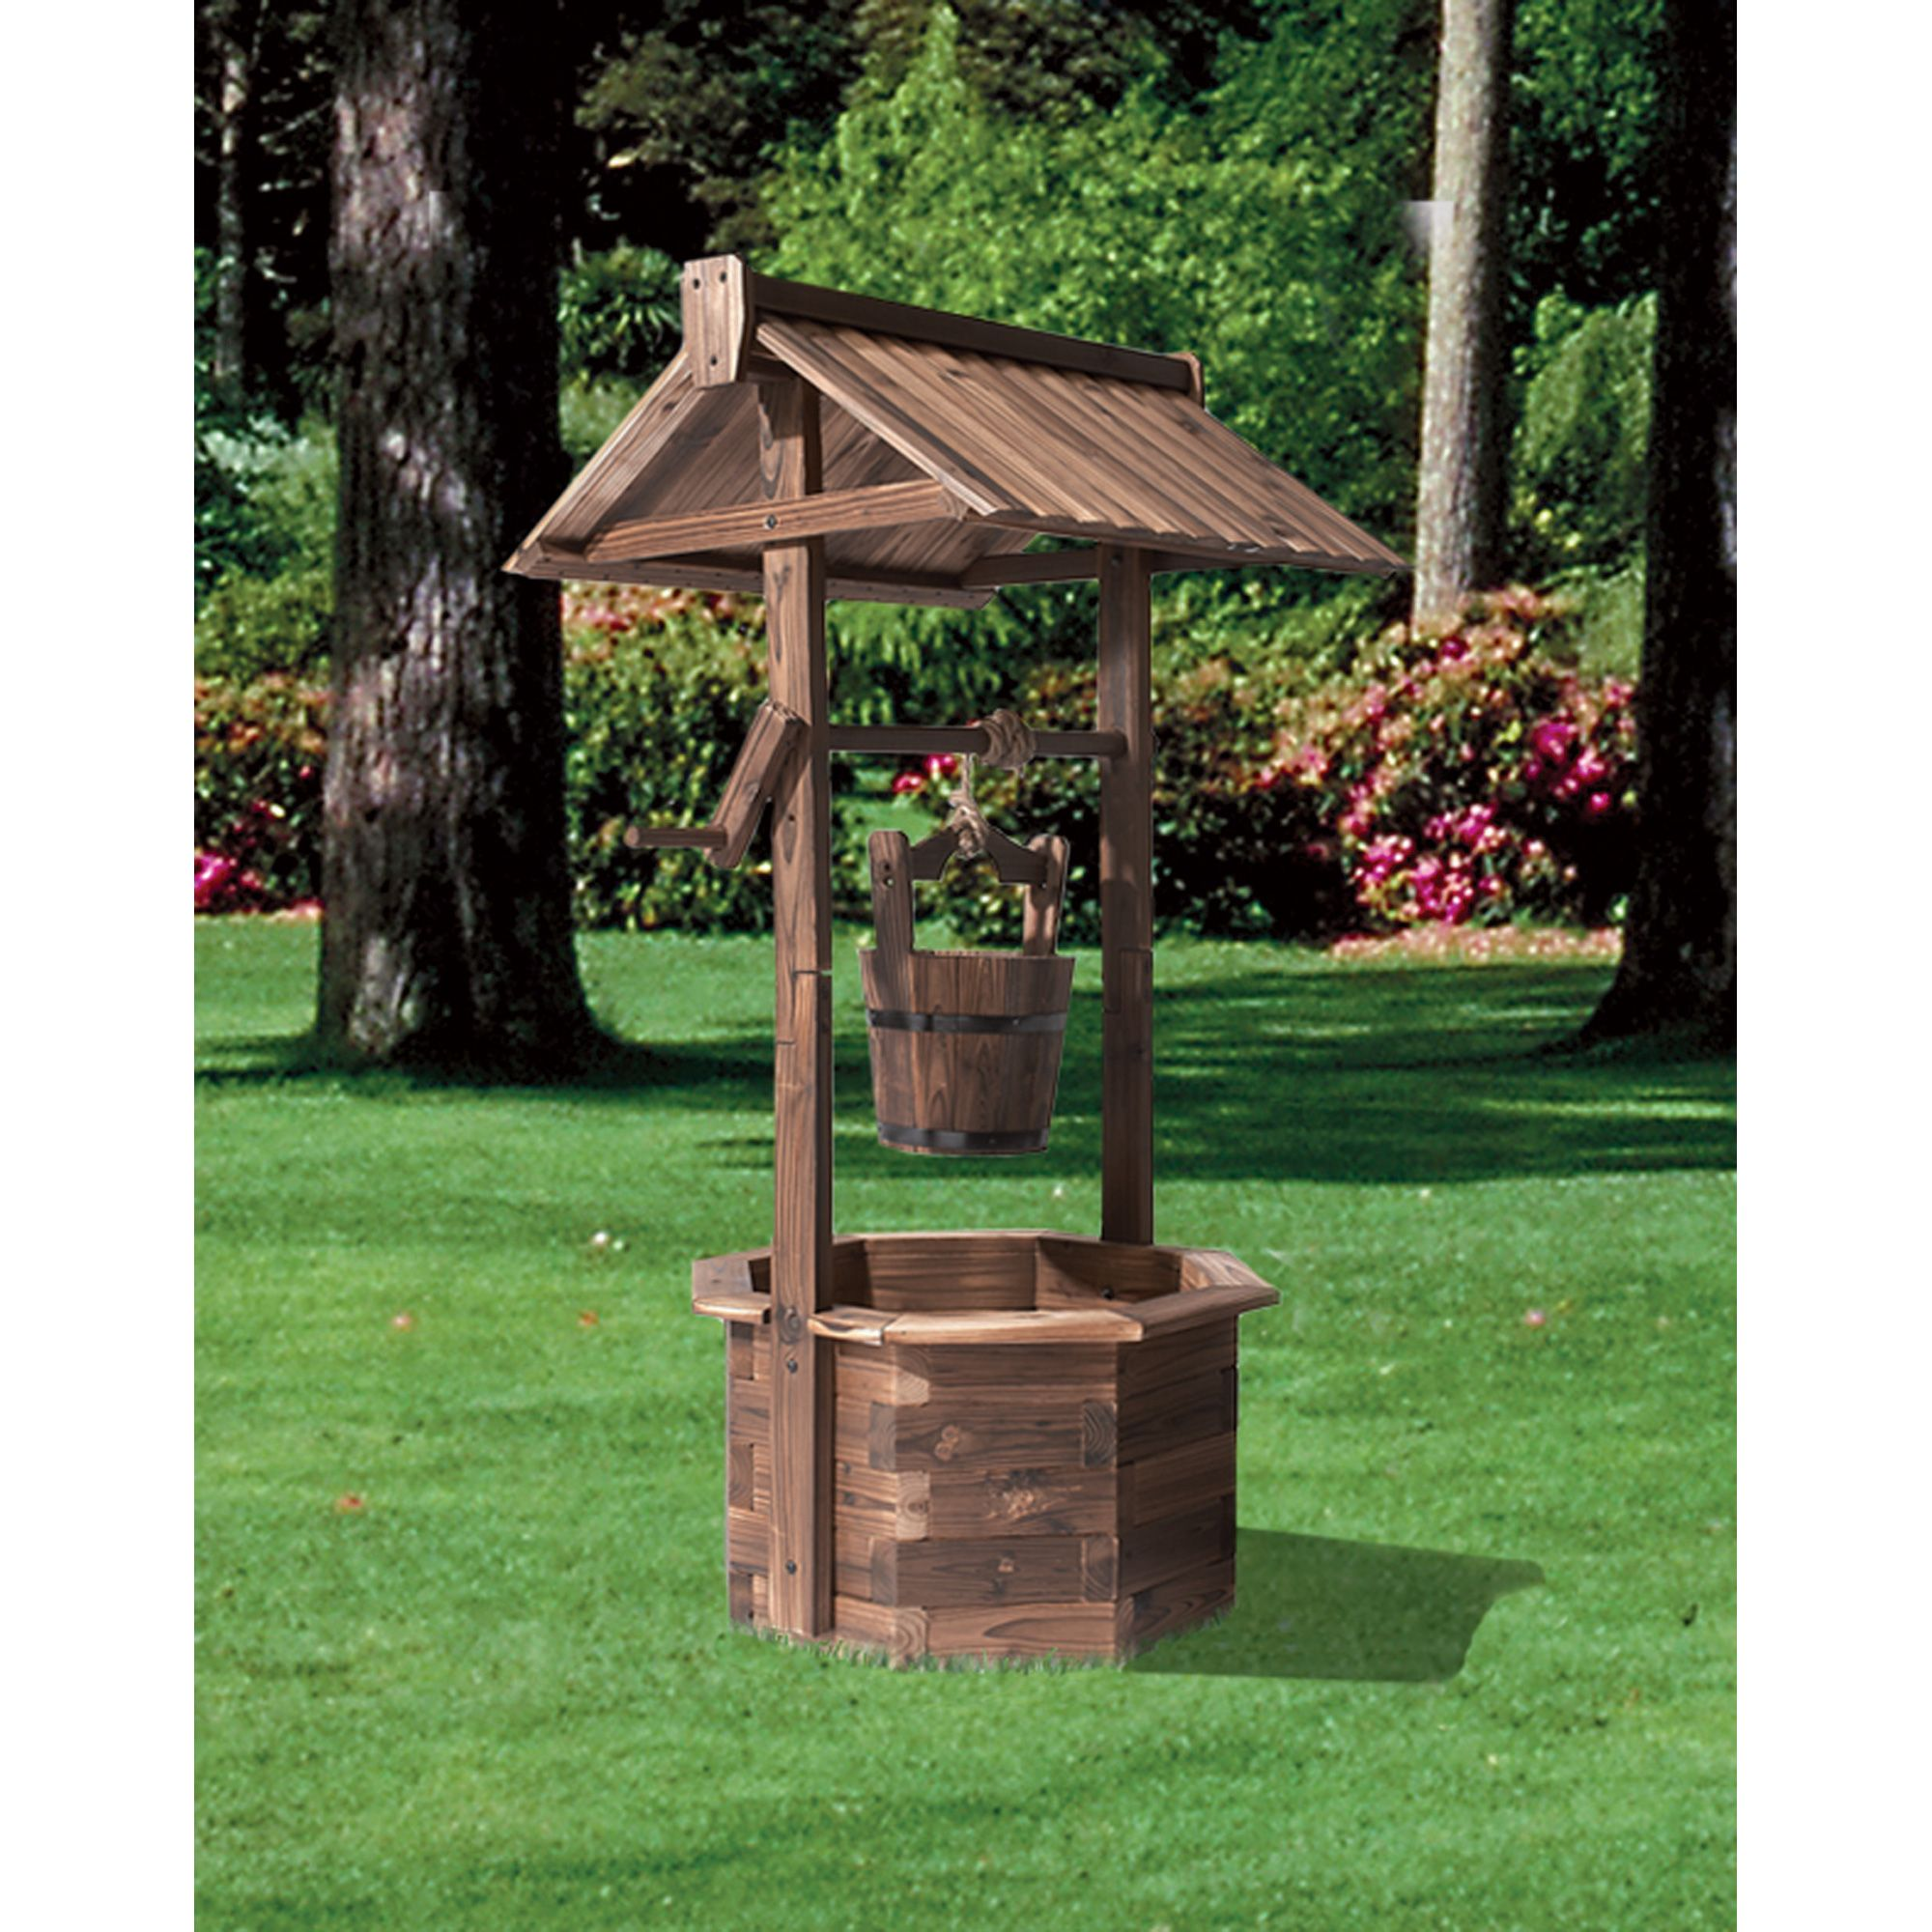 Stonegate designs wooden wishing well planter burnt finish model xl310